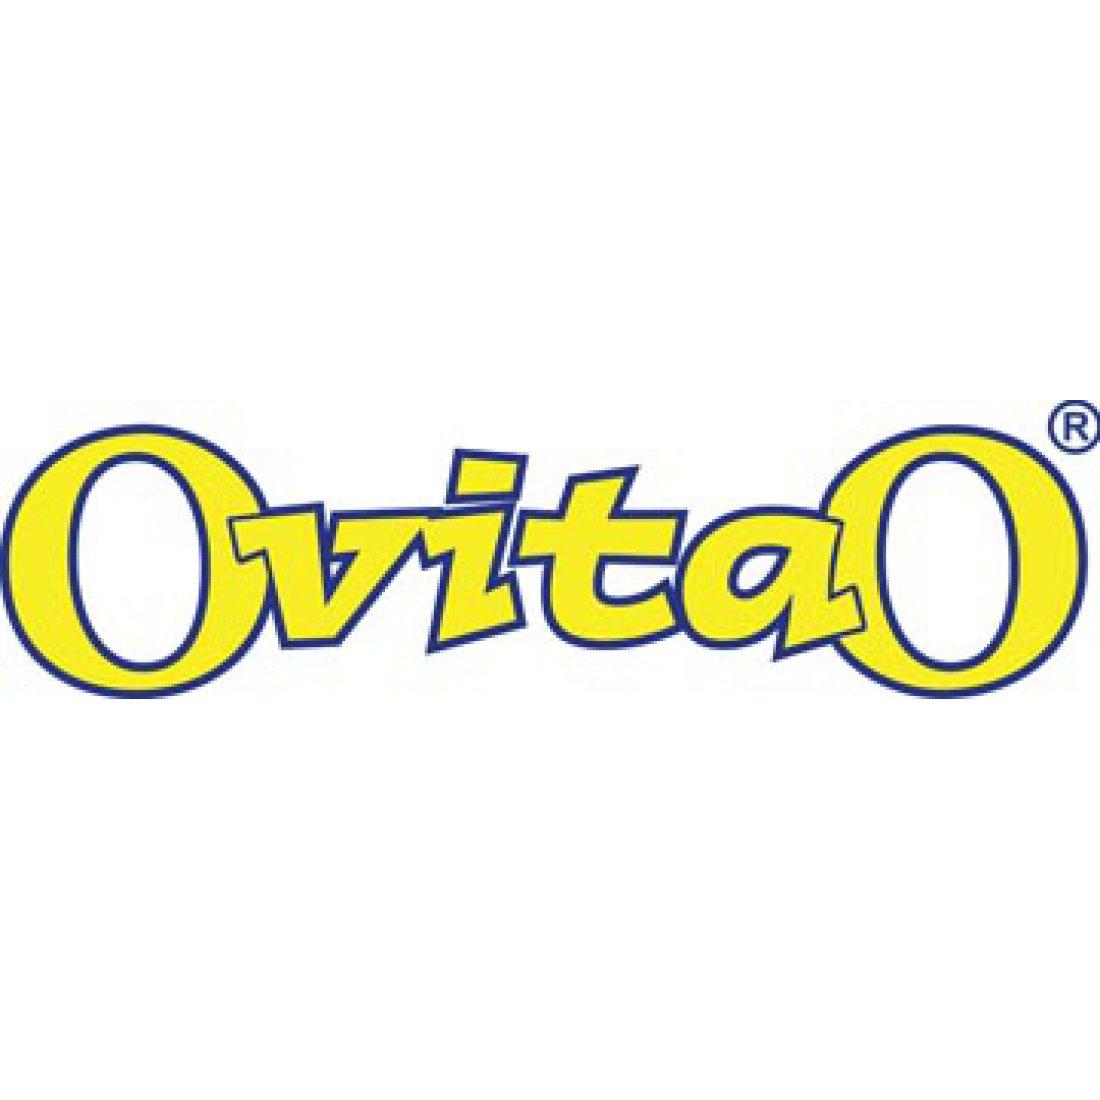 OvitaO